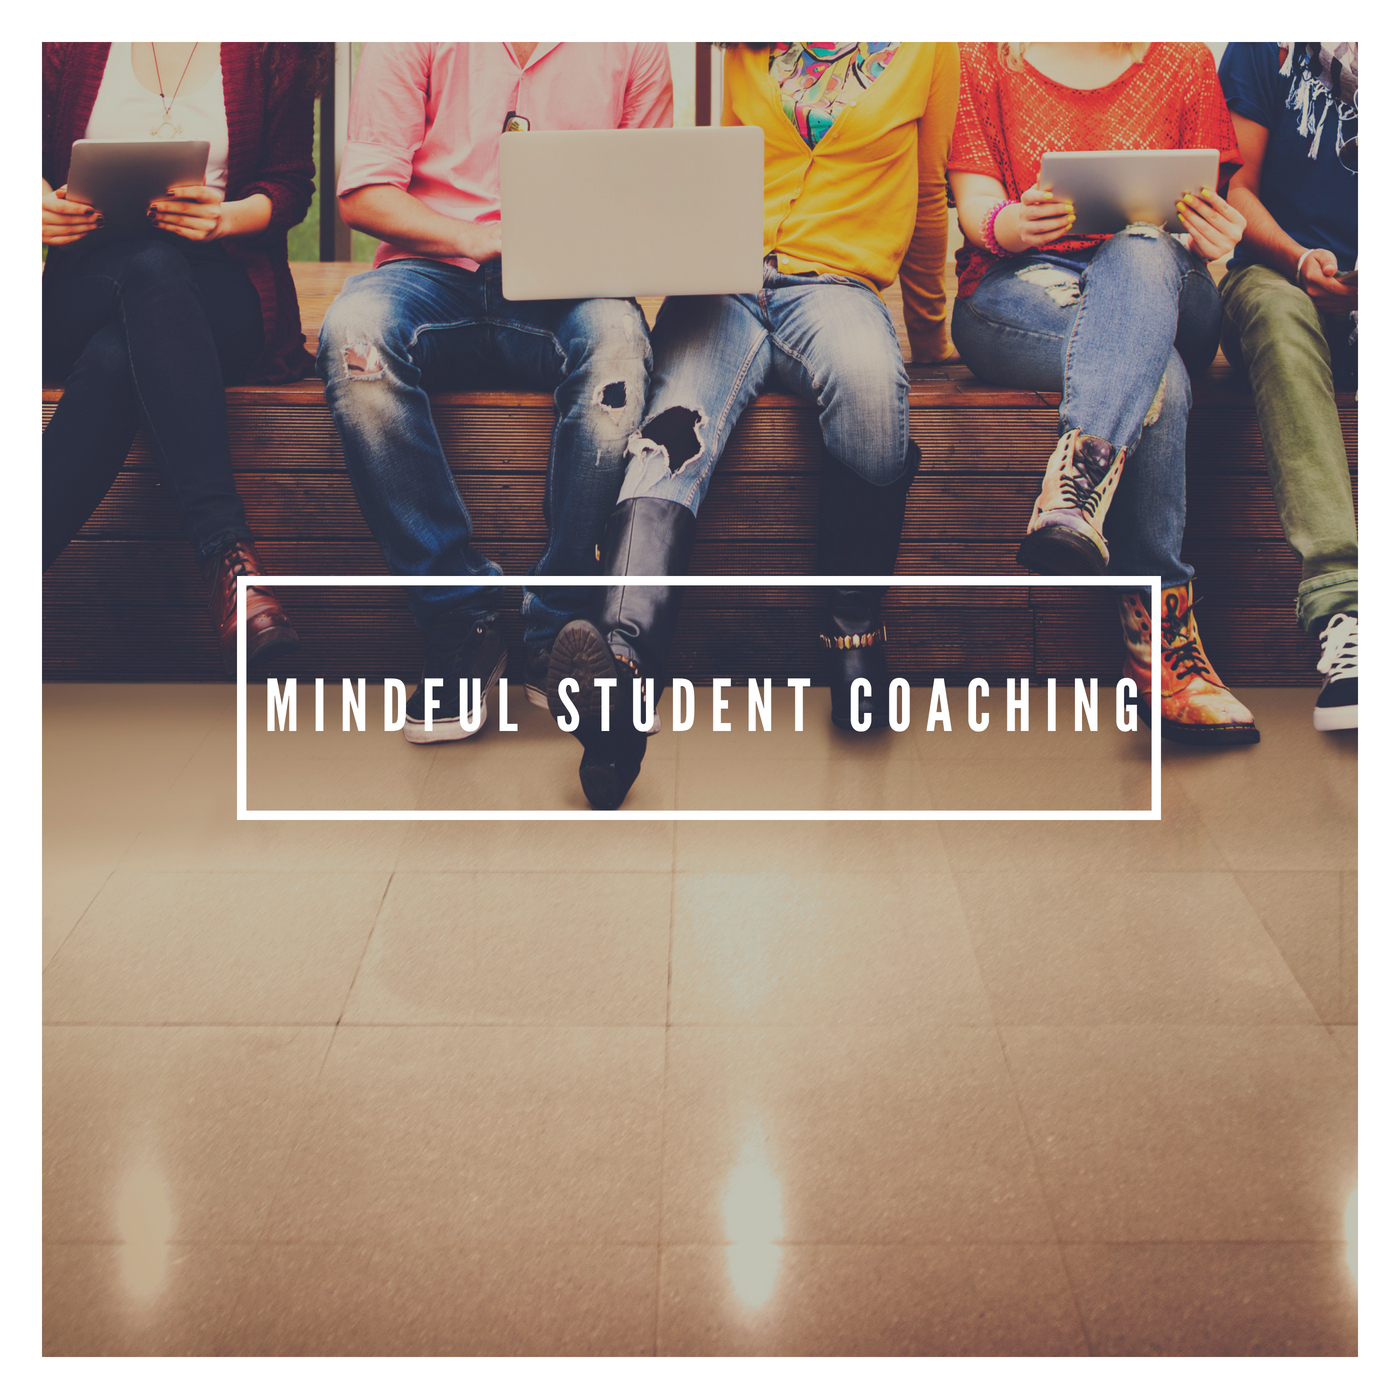 Mindful Student Coaching